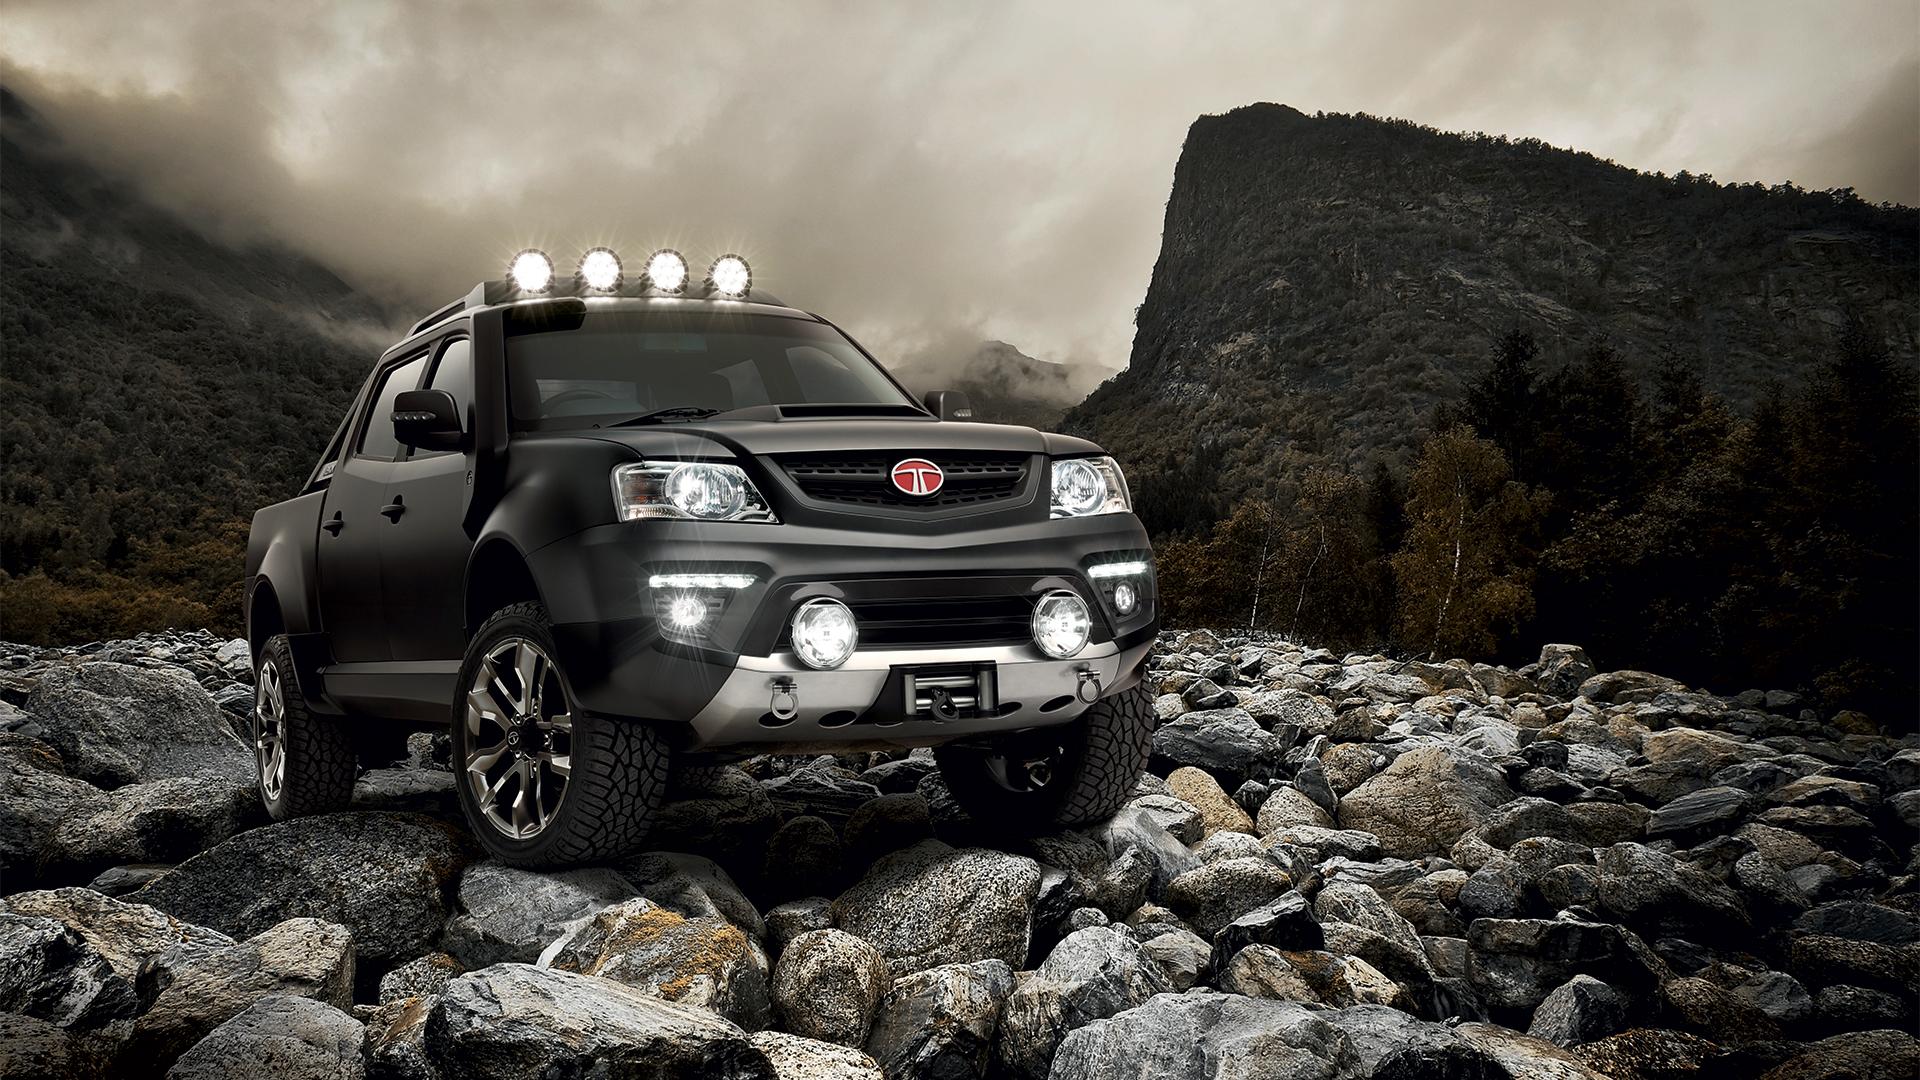 Tata working on next-generation Xenon pick-up